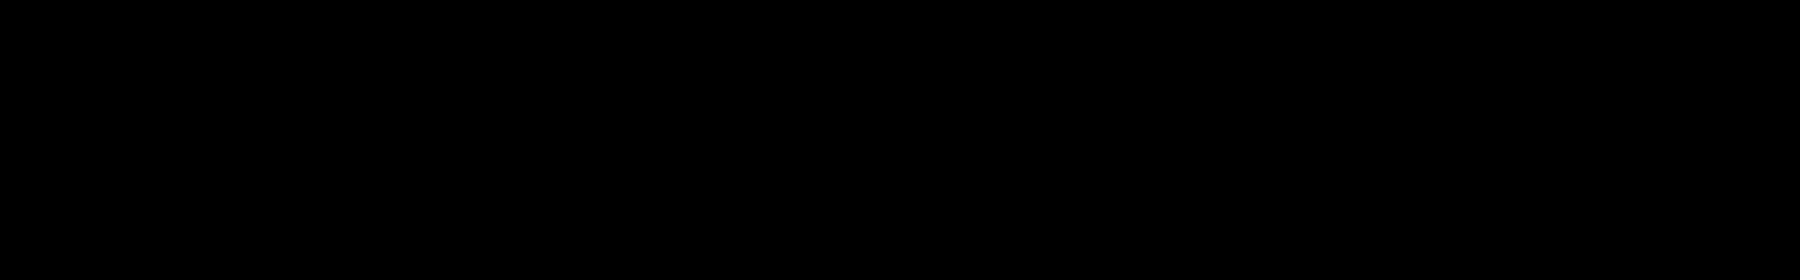 Unmüte Ritual audio waveform